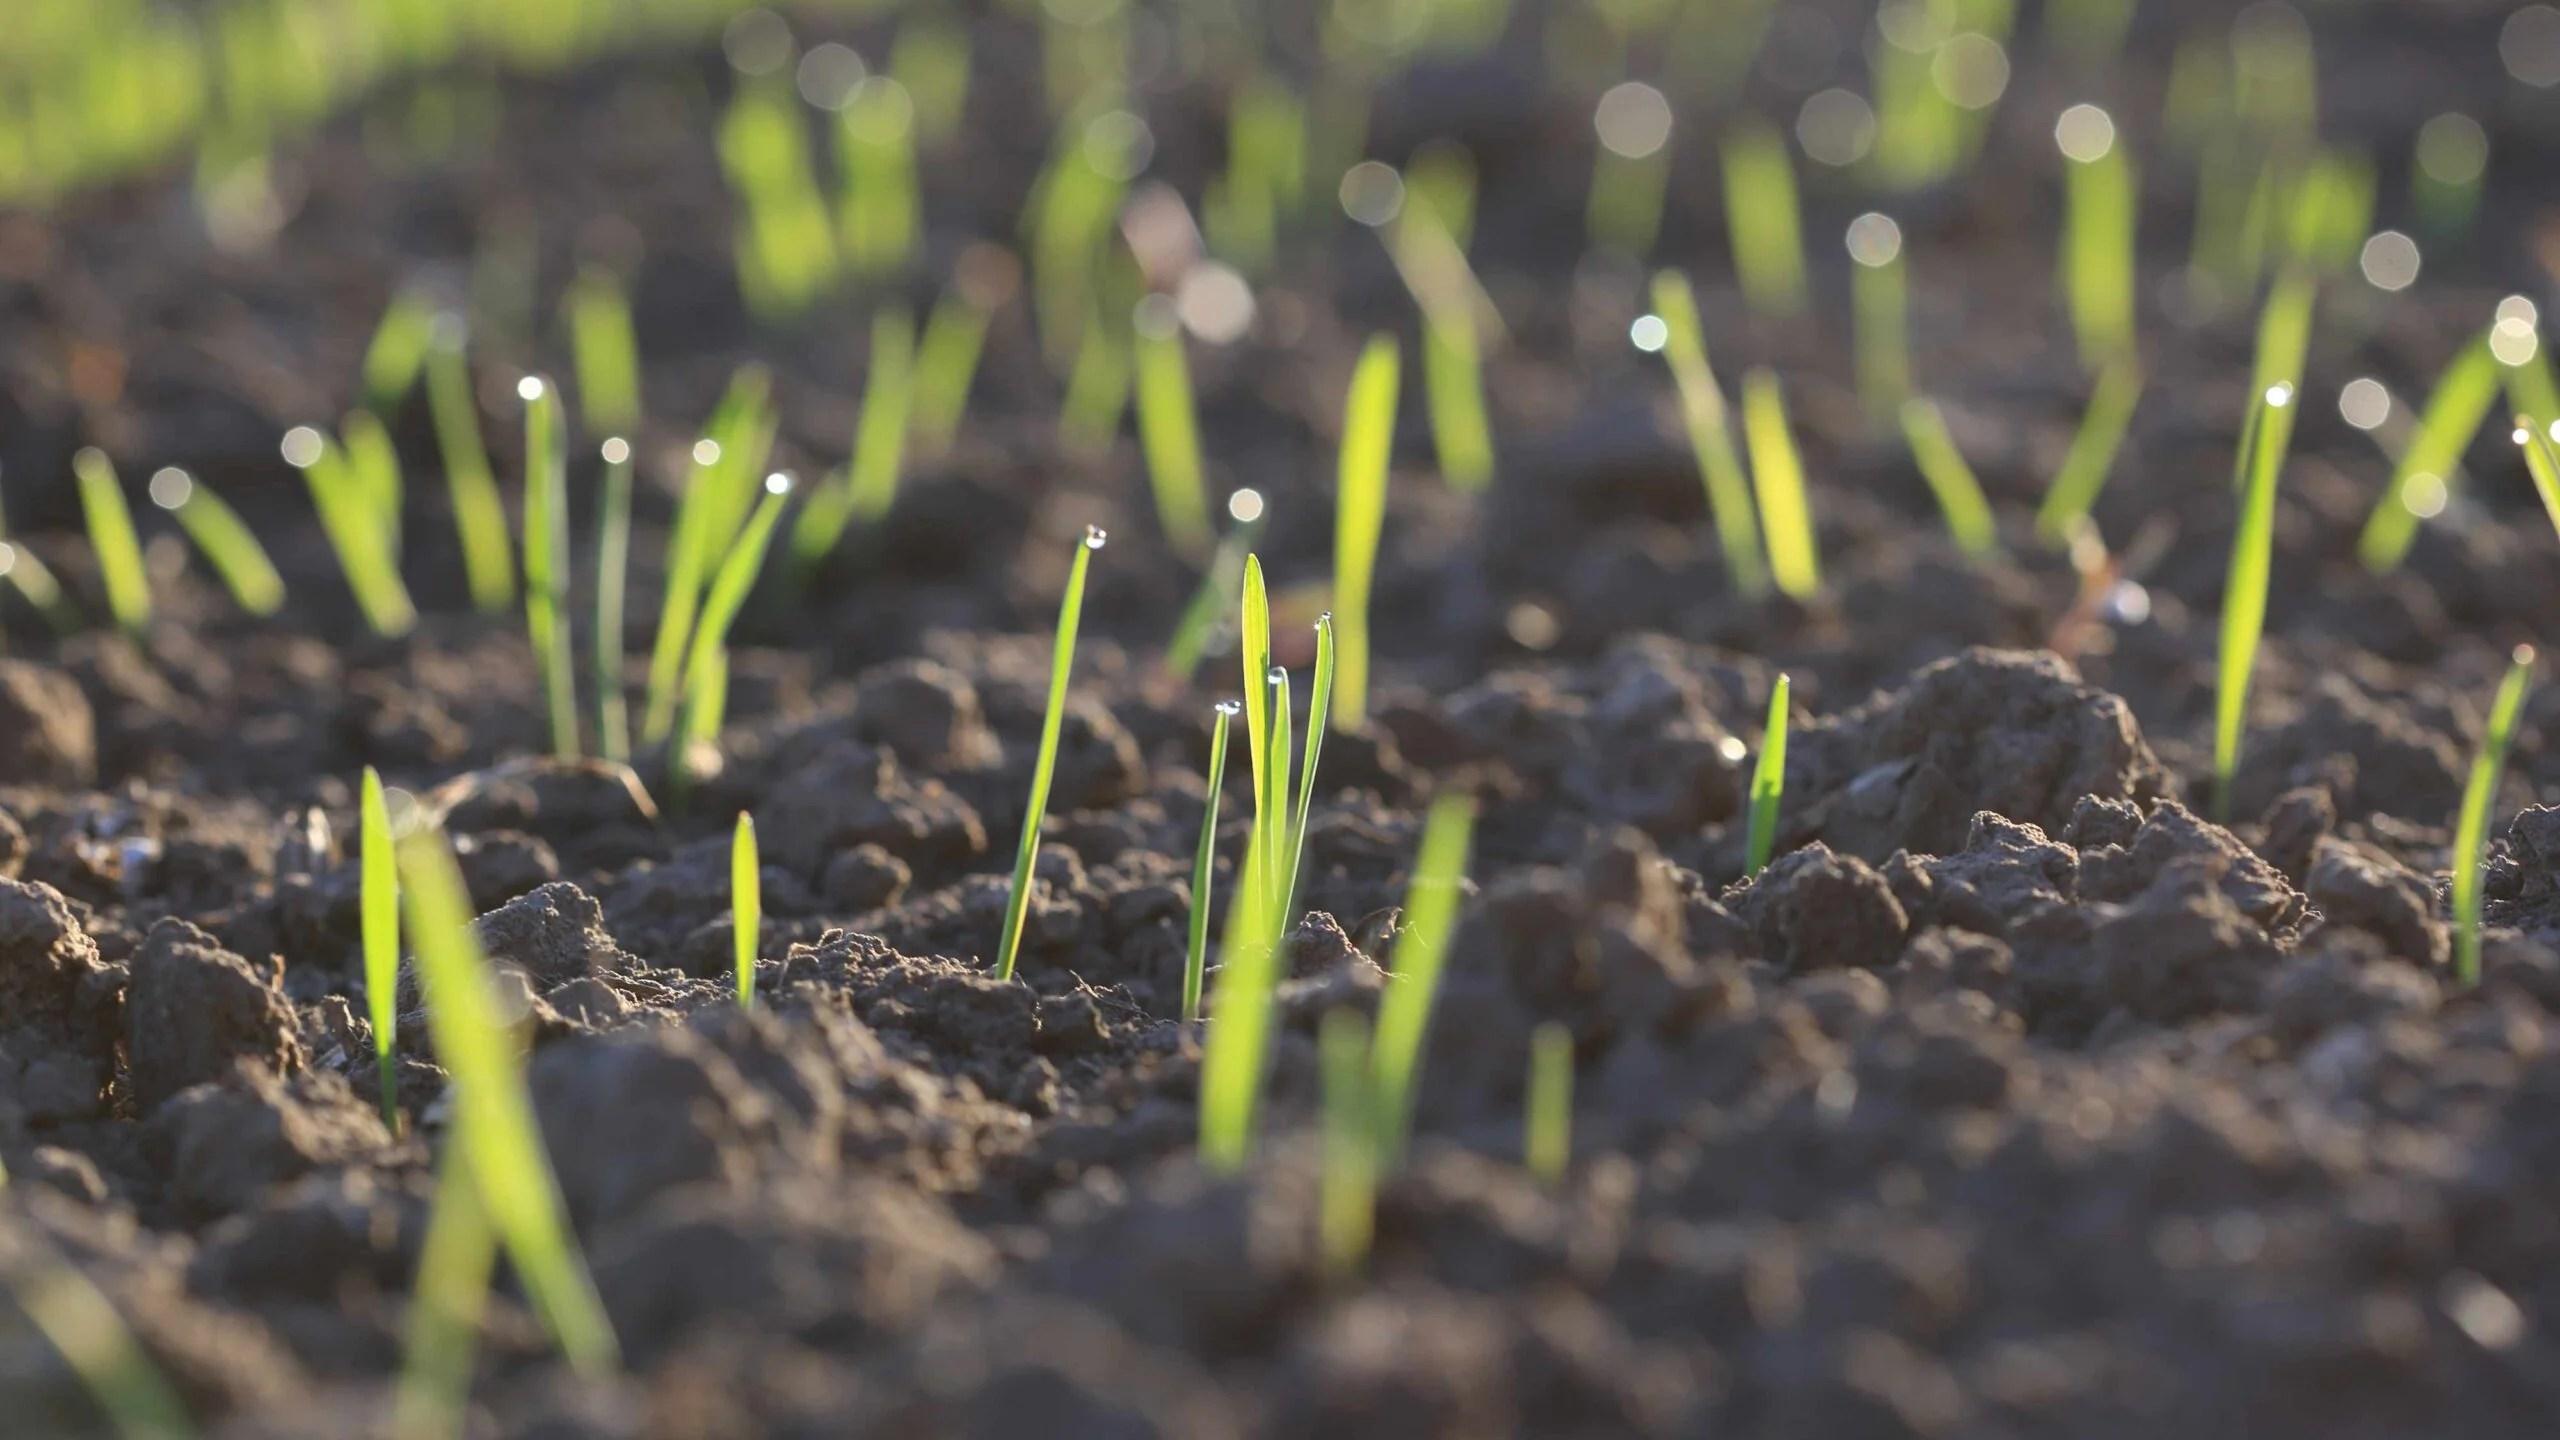 planting new grass